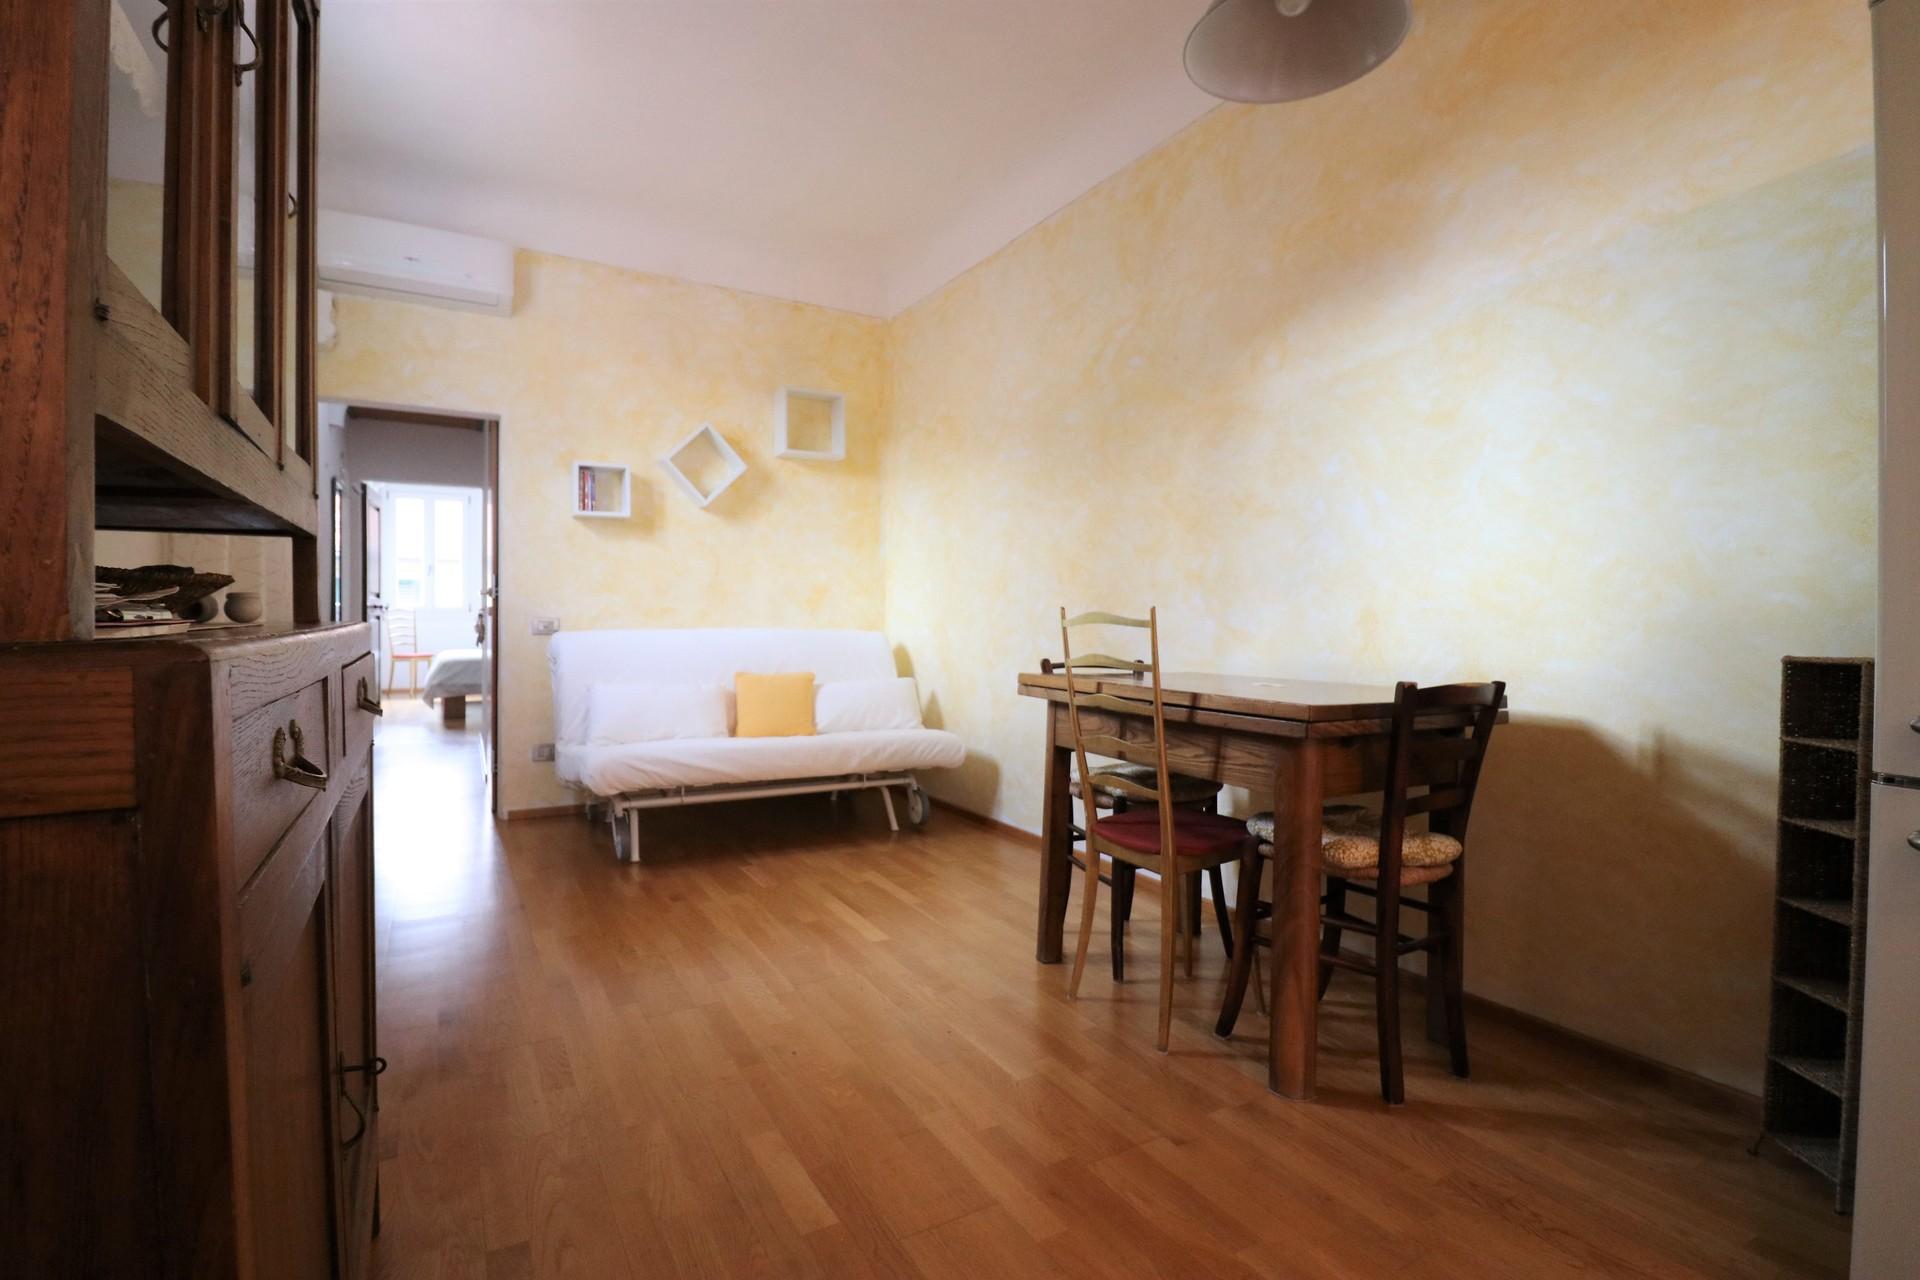 Casa in vendita in via Santa Reparata | Homes in Florence Real Estate